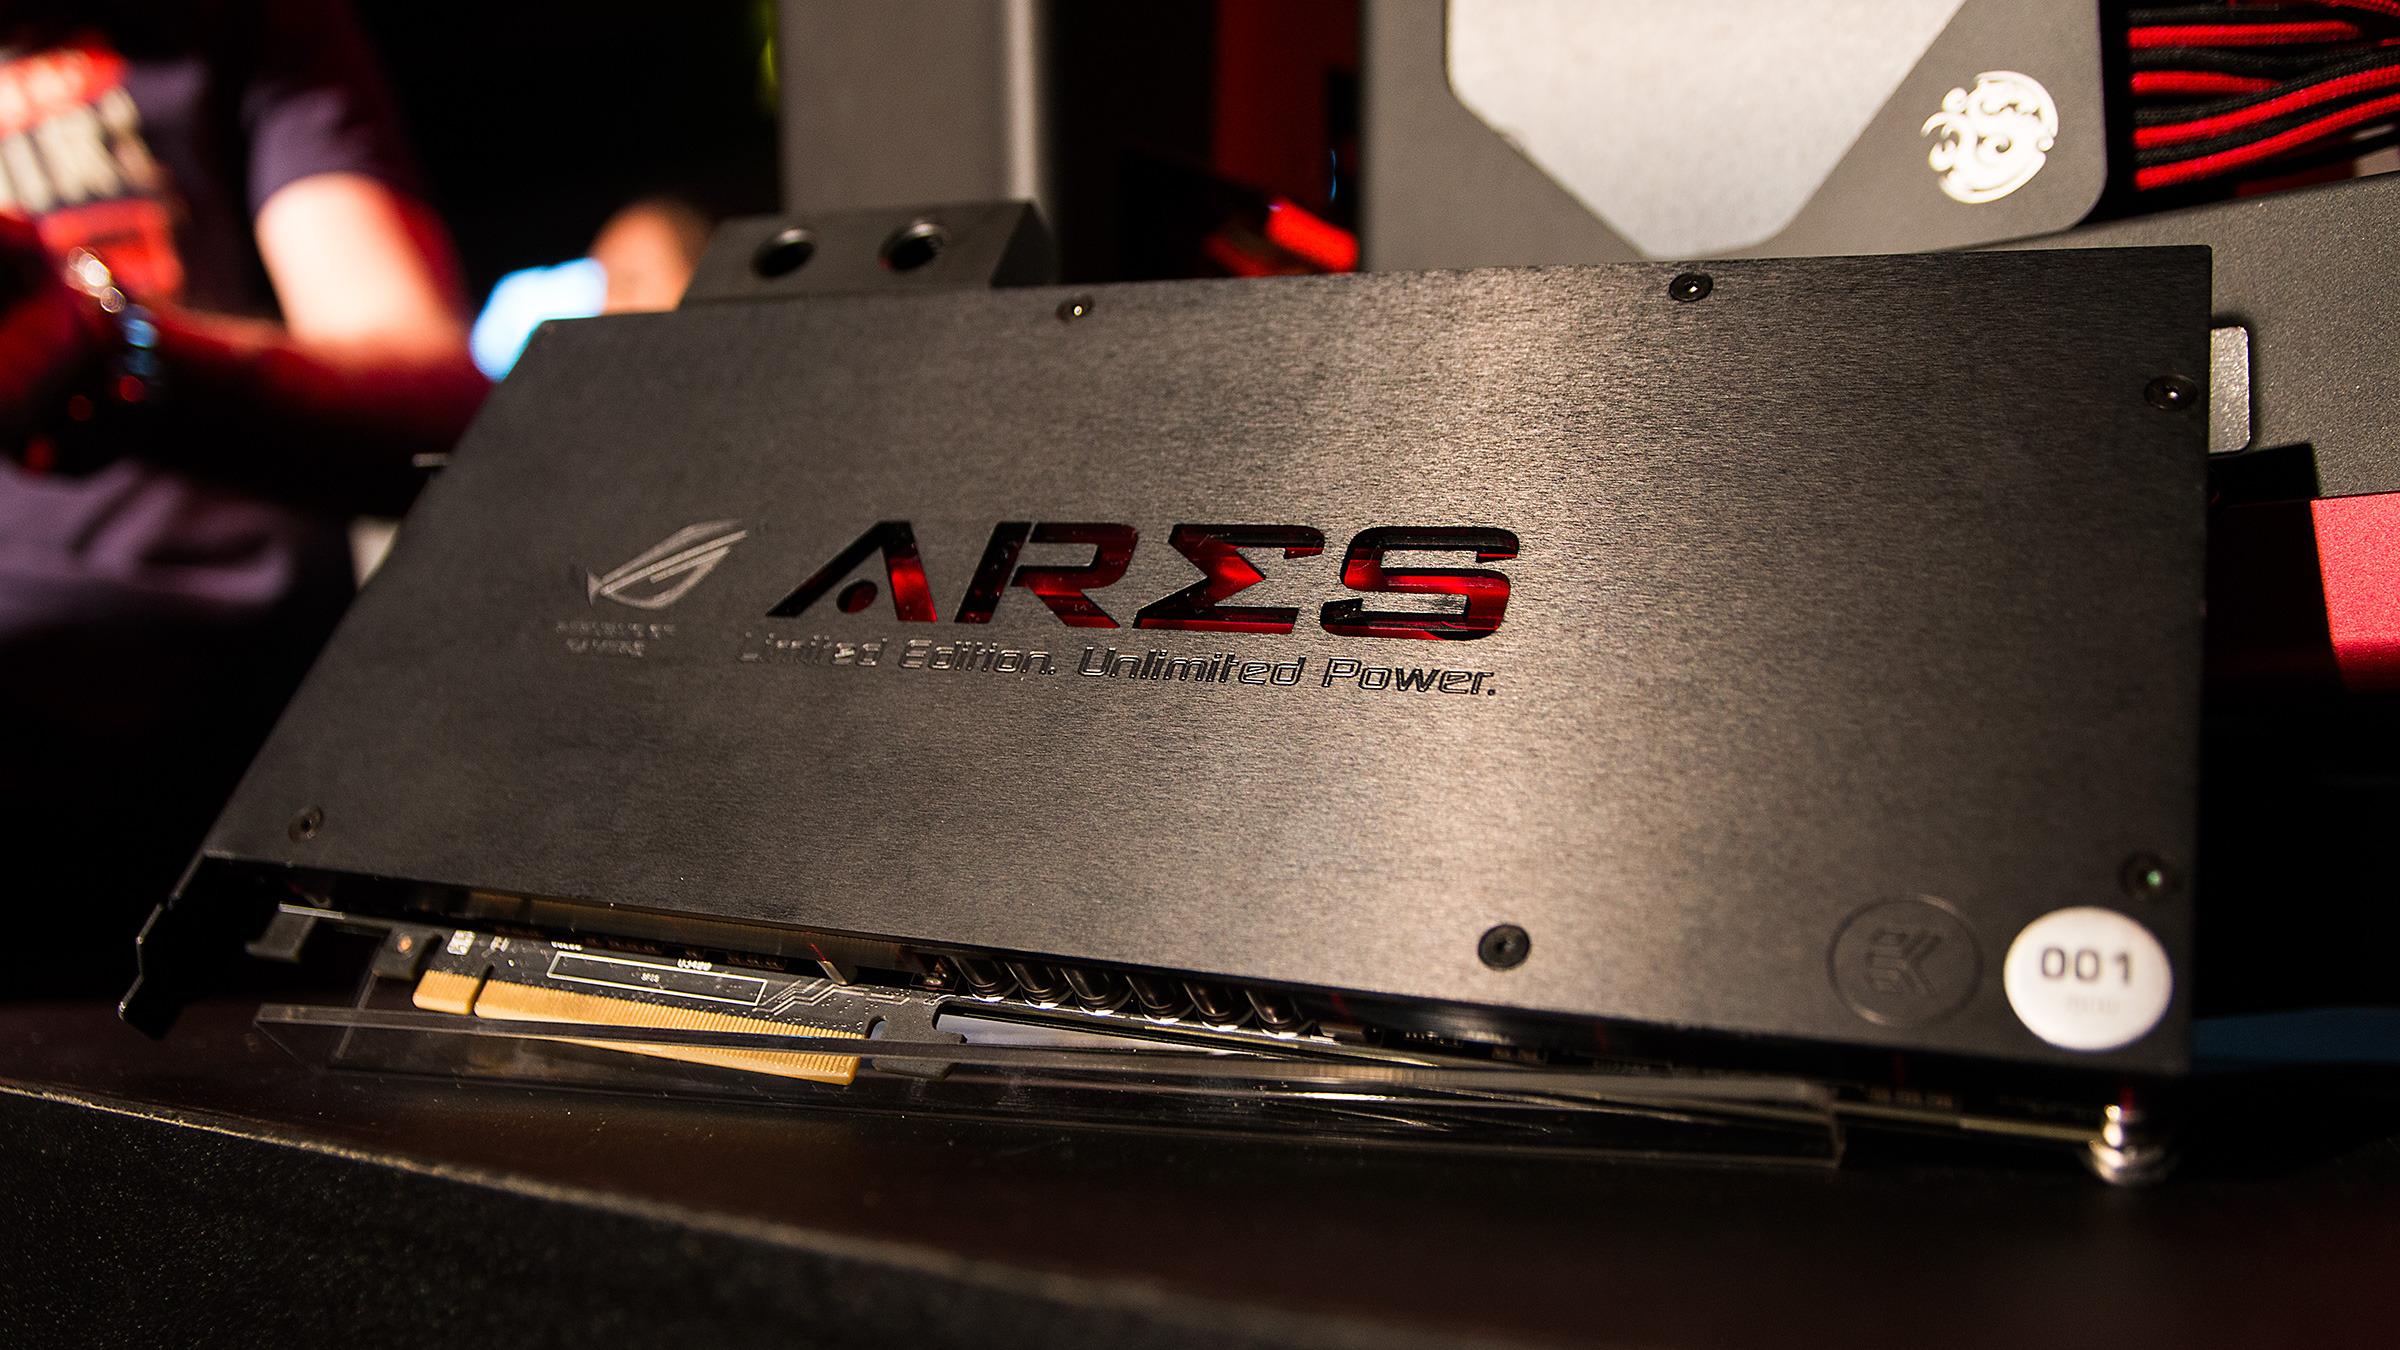 NVIDIA закрыла партнерскую программу GeForce из-за скандалов